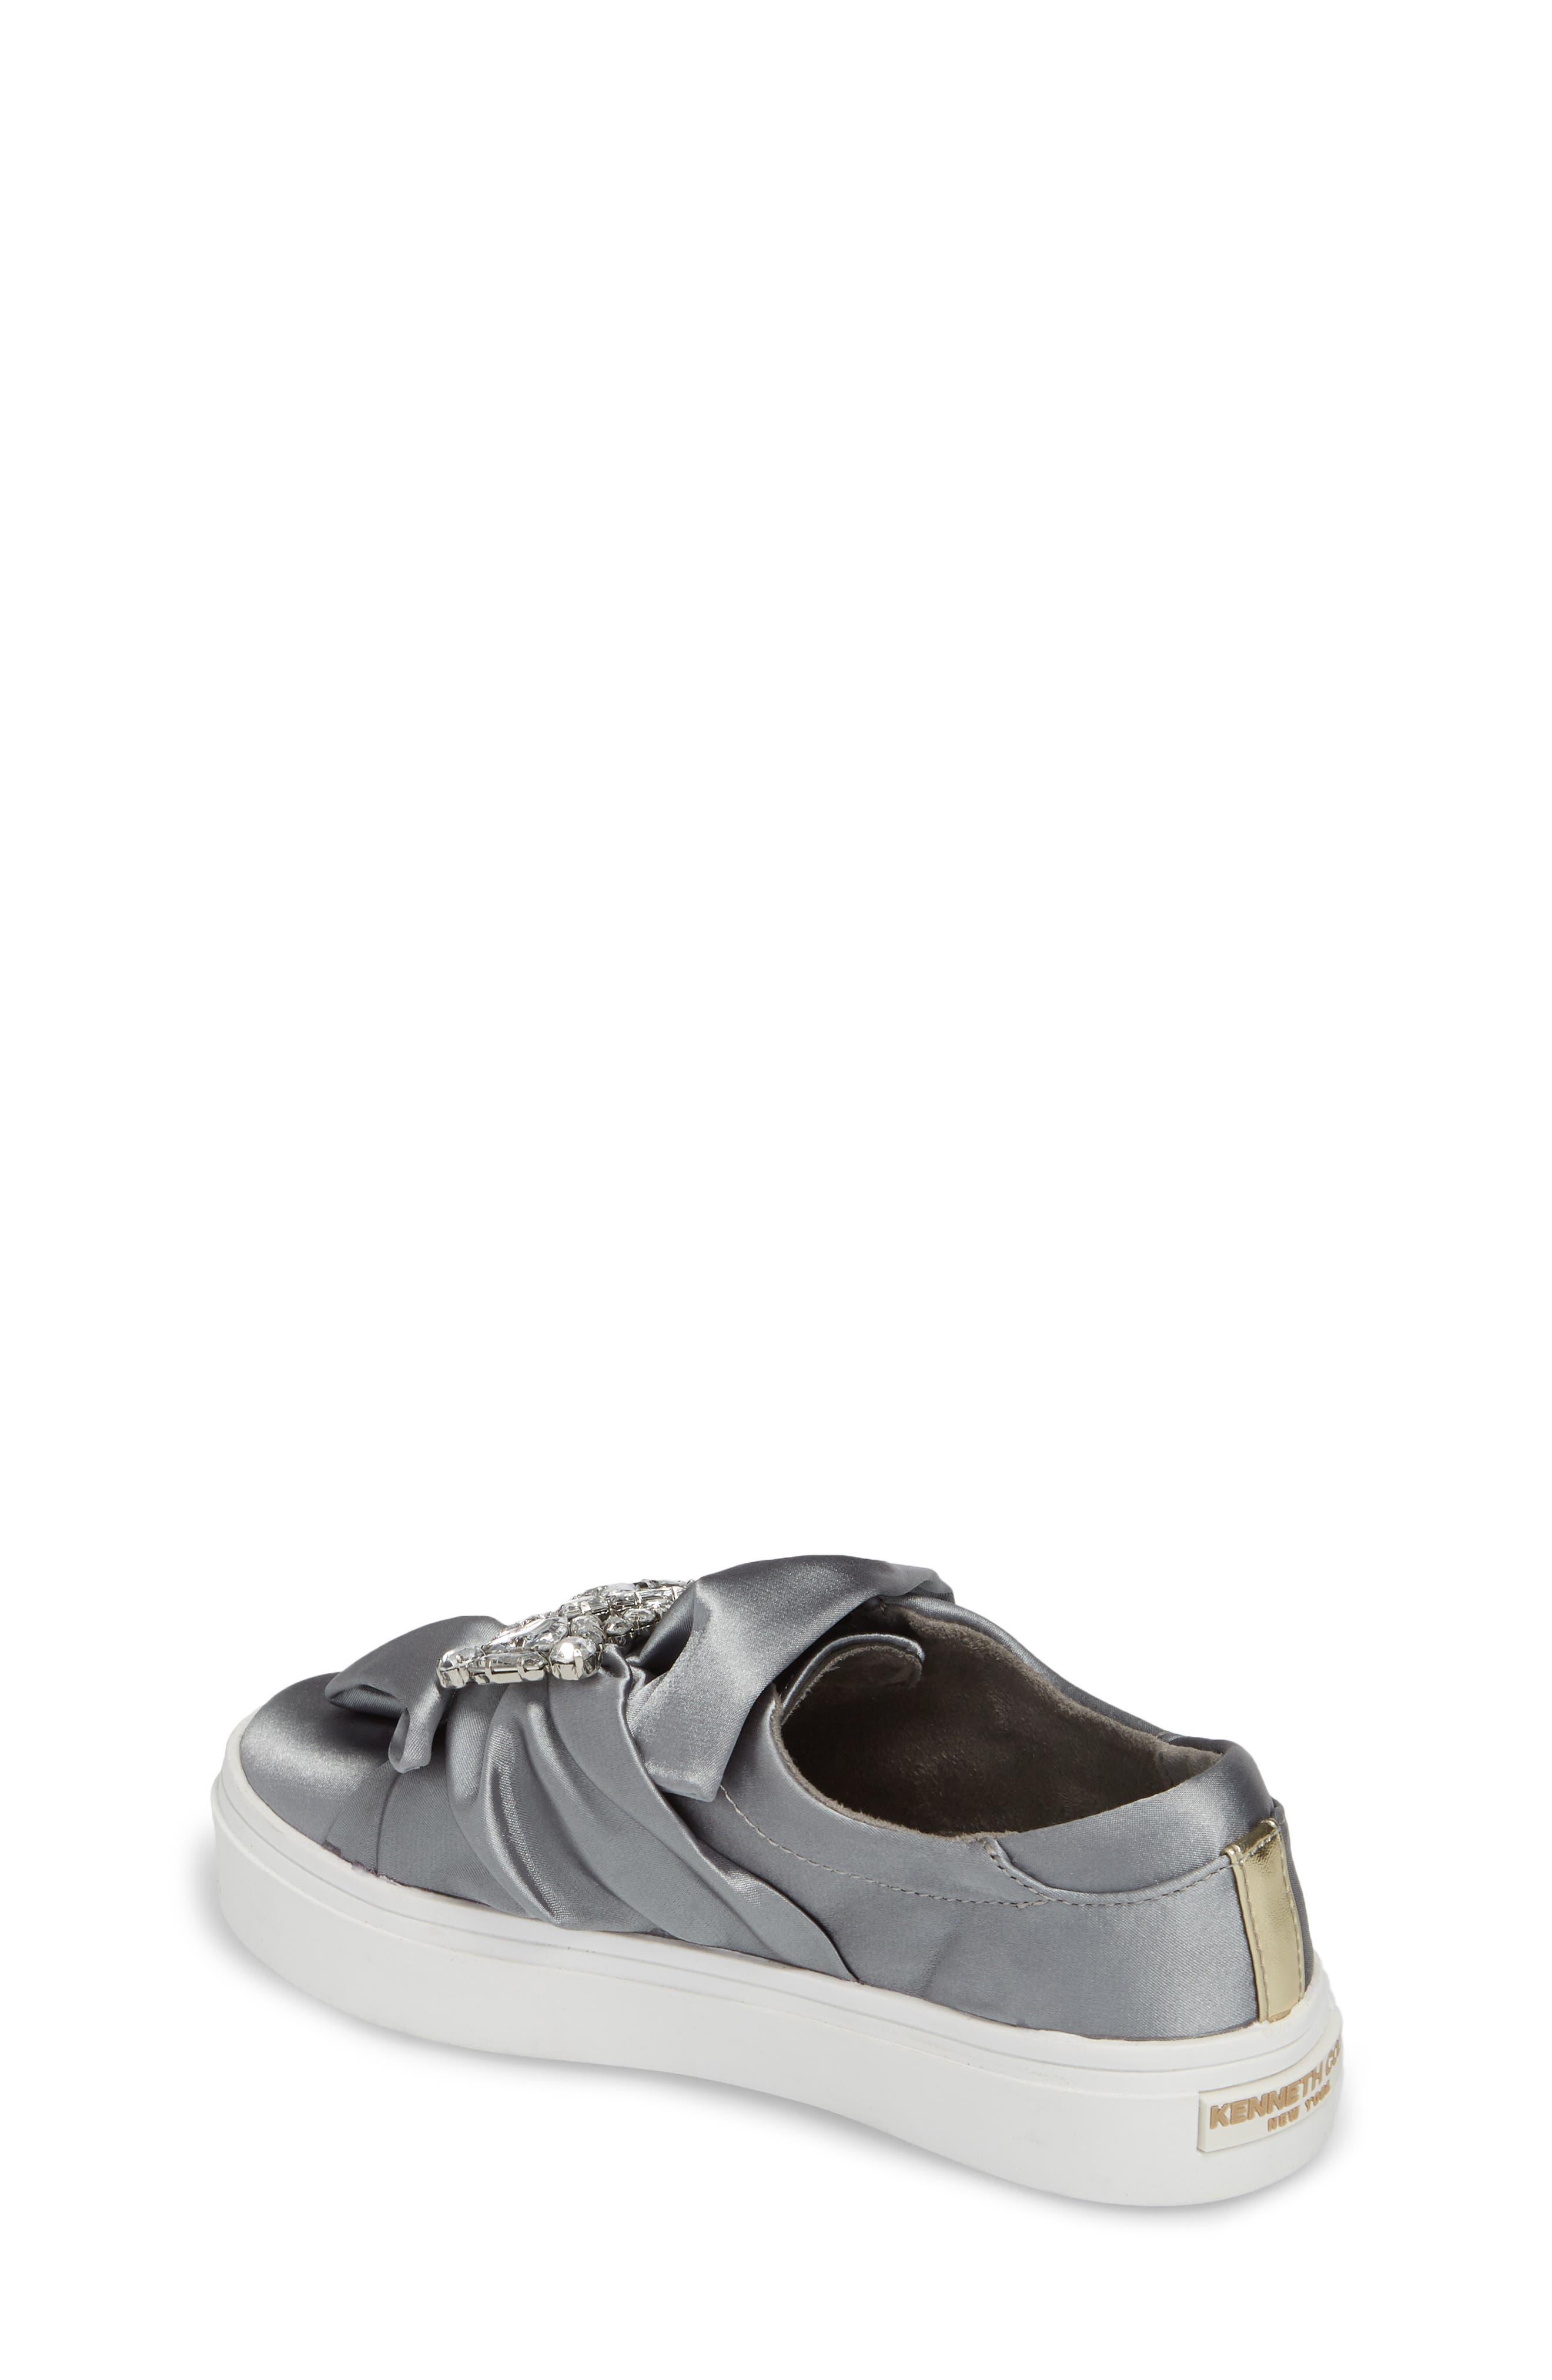 Shout Shine Embellished Sneaker,                             Alternate thumbnail 2, color,                             050